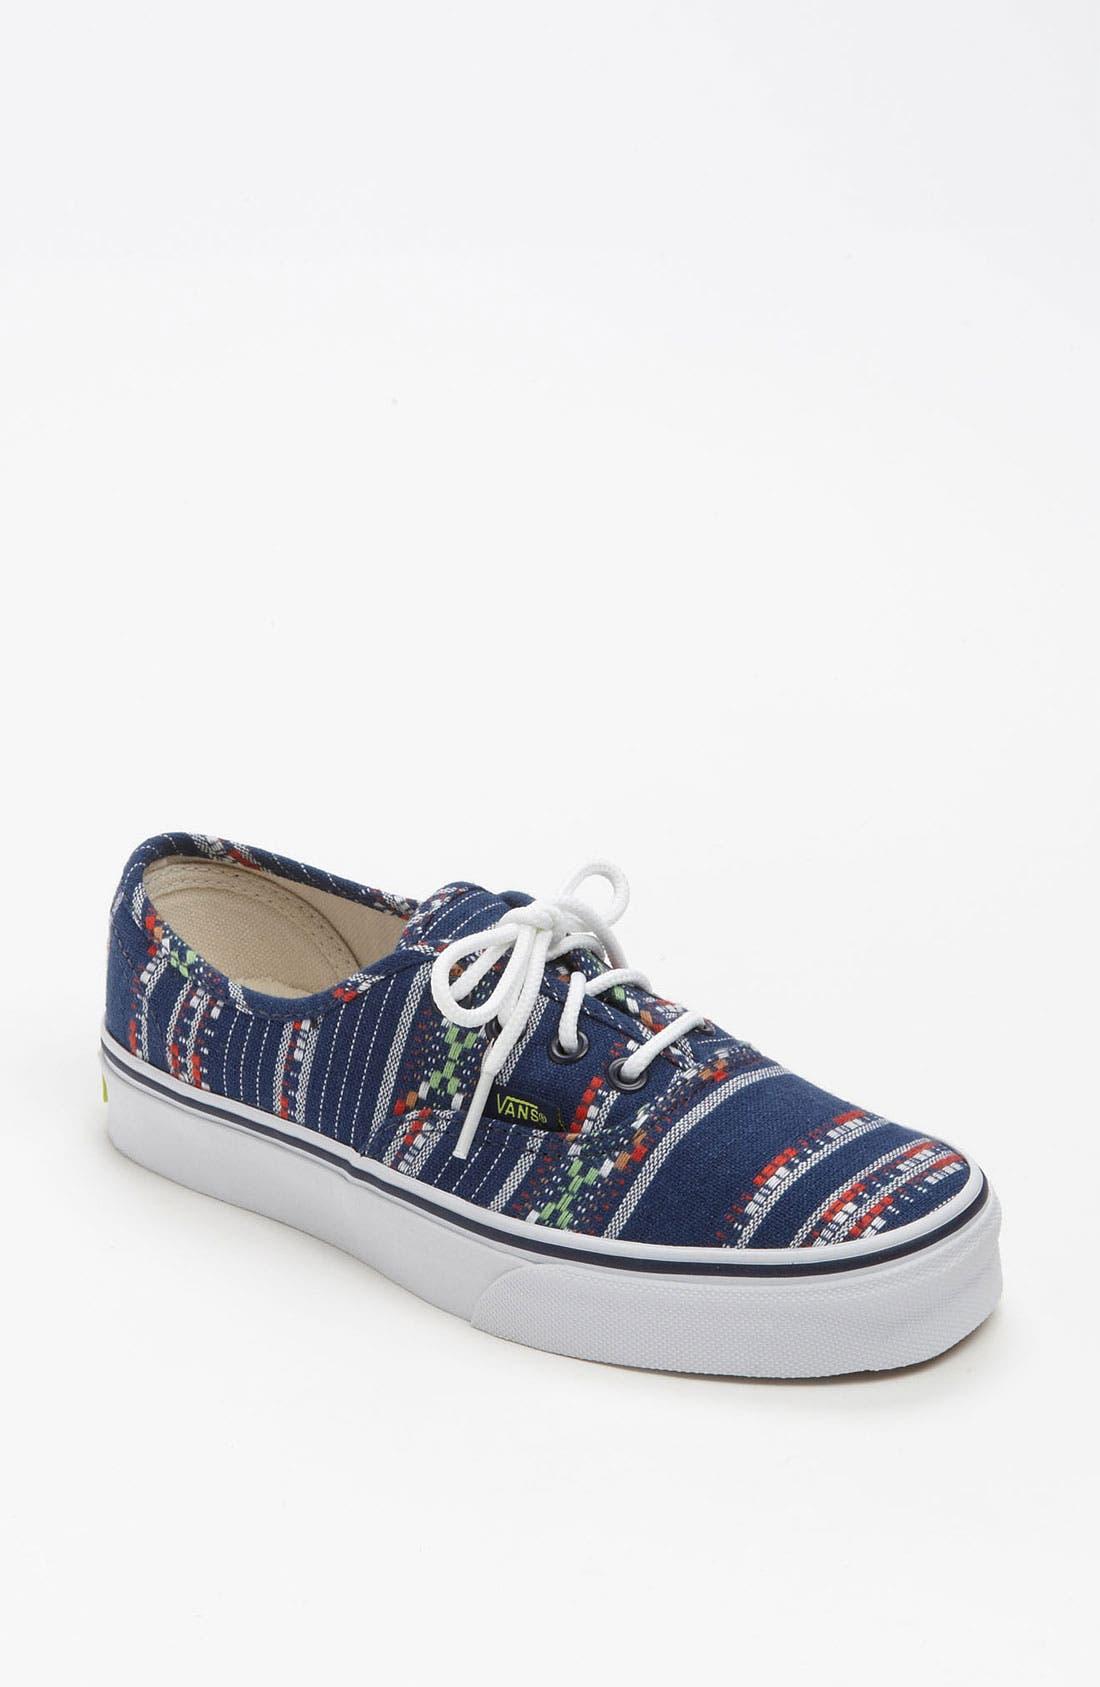 Alternate Image 1 Selected - Vans 'Authentic - Guate Stripe' Sneaker